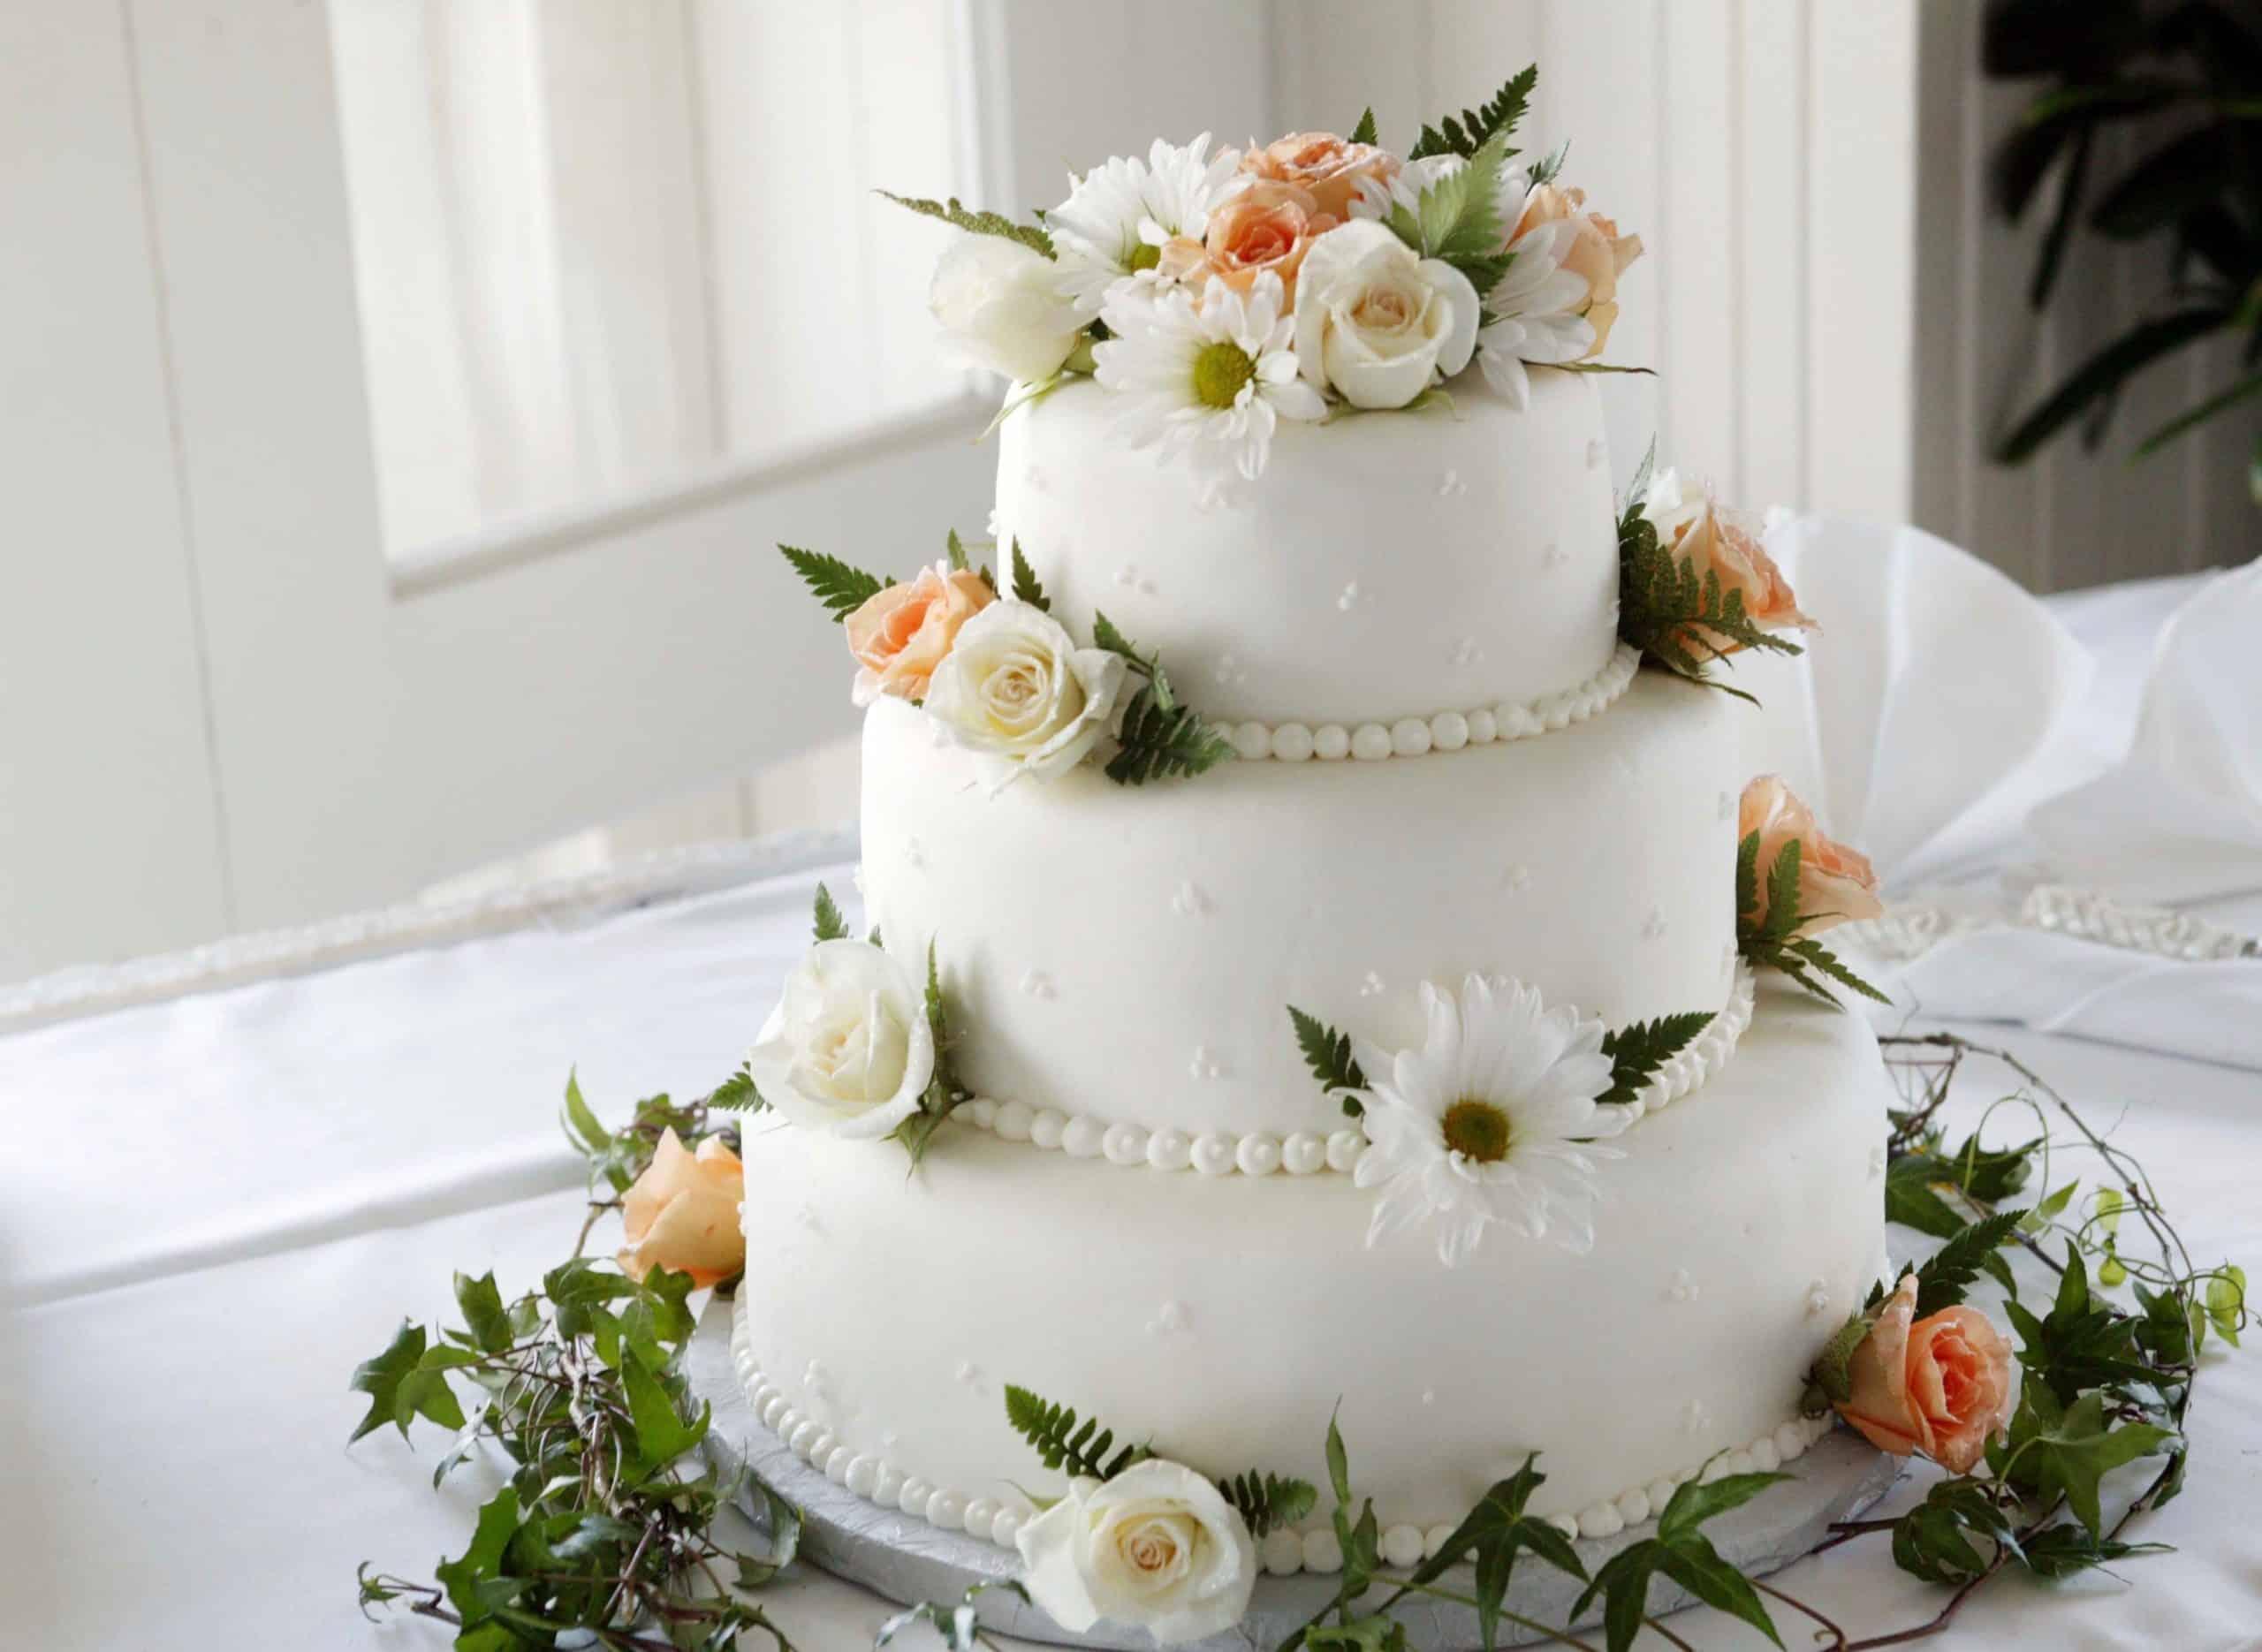 Best Cake Decoration course tutorial class certification training online